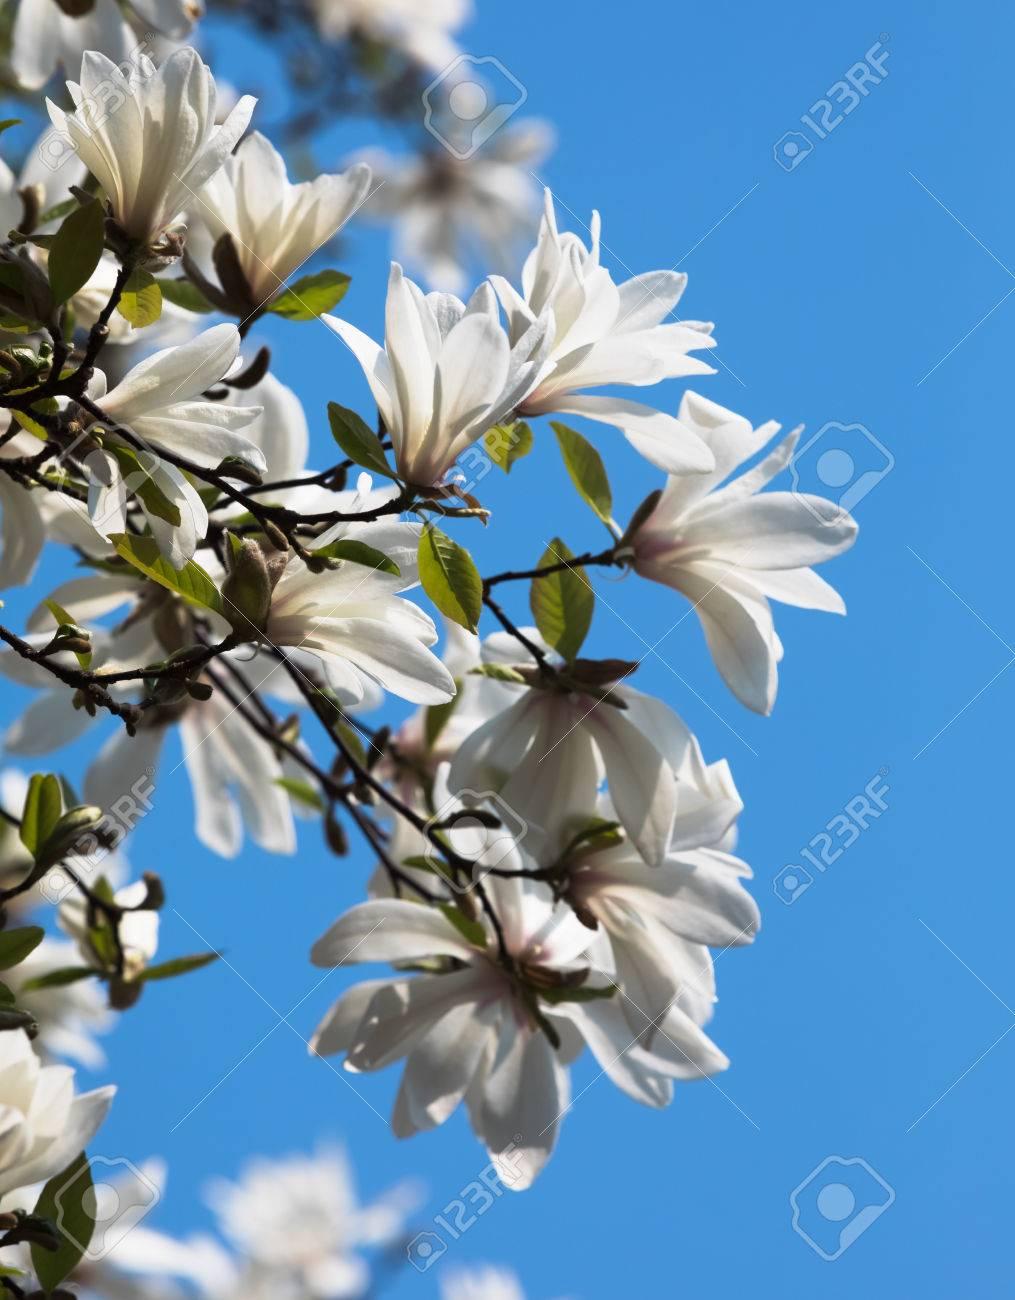 Magnolia kobus white magnolia flowers blooming magnolia tree magnolia kobus white magnolia flowers blooming magnolia tree with white flowers stock photo mightylinksfo